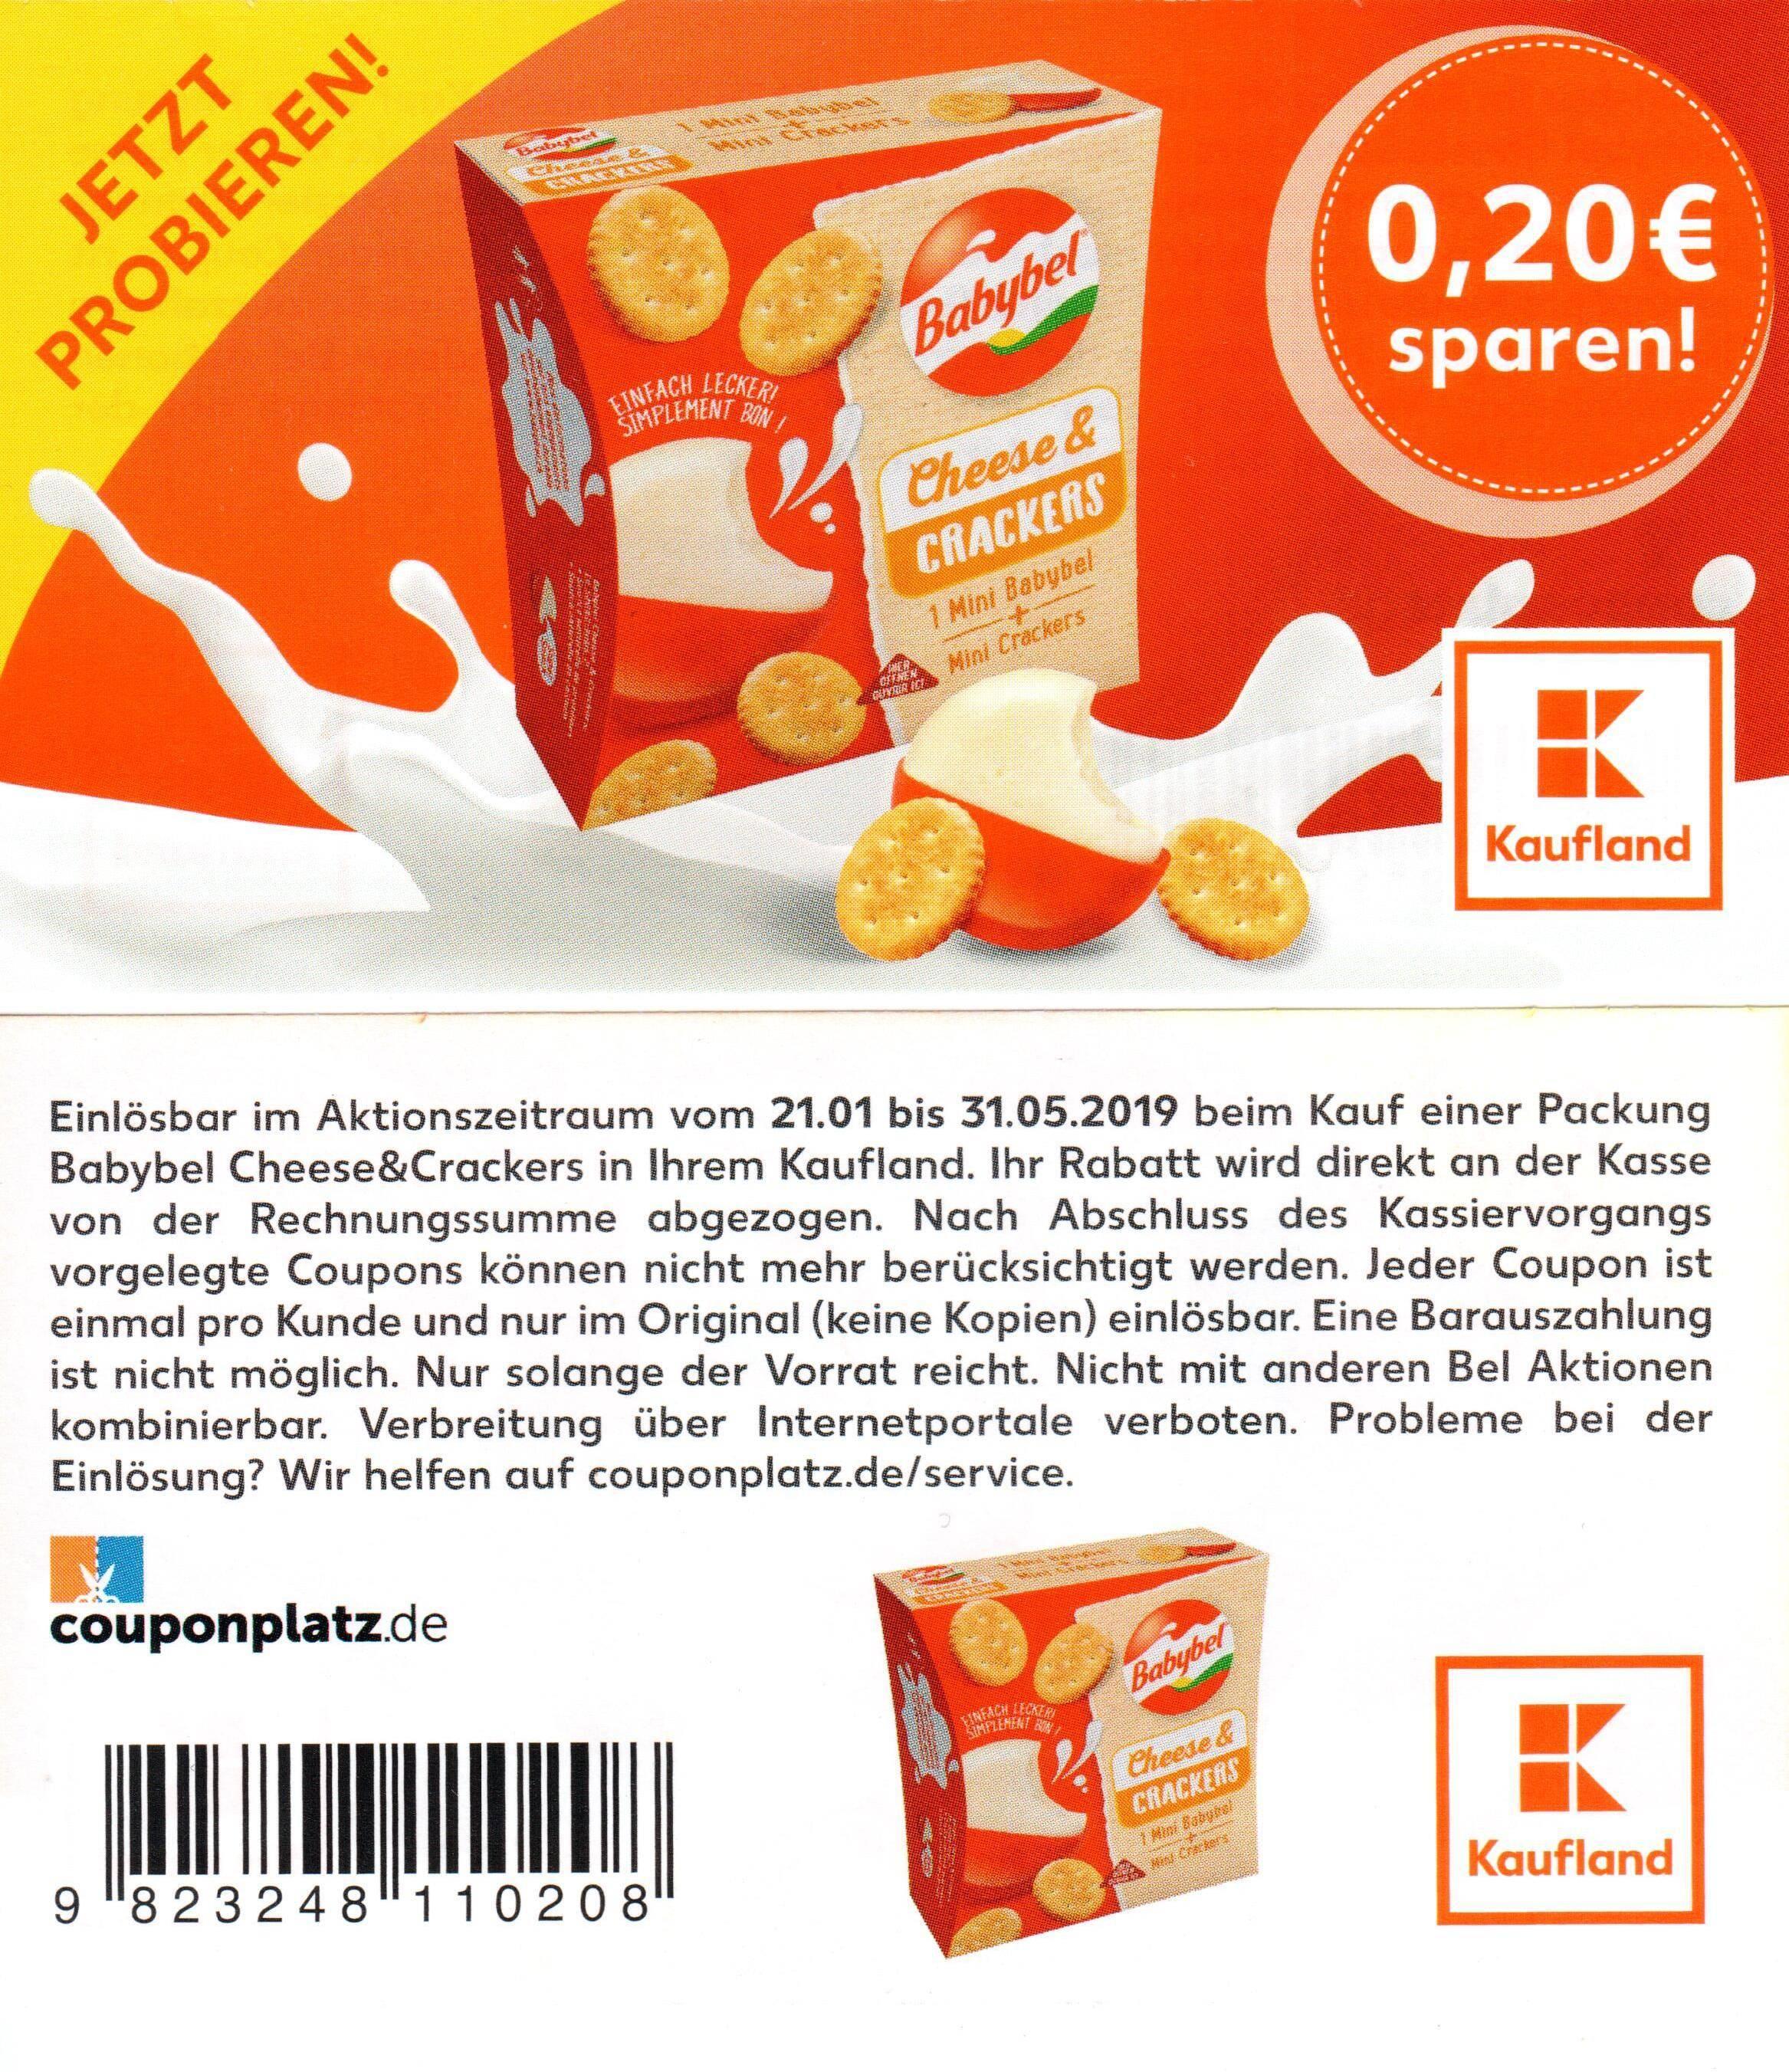 kaufland neuer 0 40 coupon f r mini babybel bio und 0 20 coupon f r babybel cheese. Black Bedroom Furniture Sets. Home Design Ideas